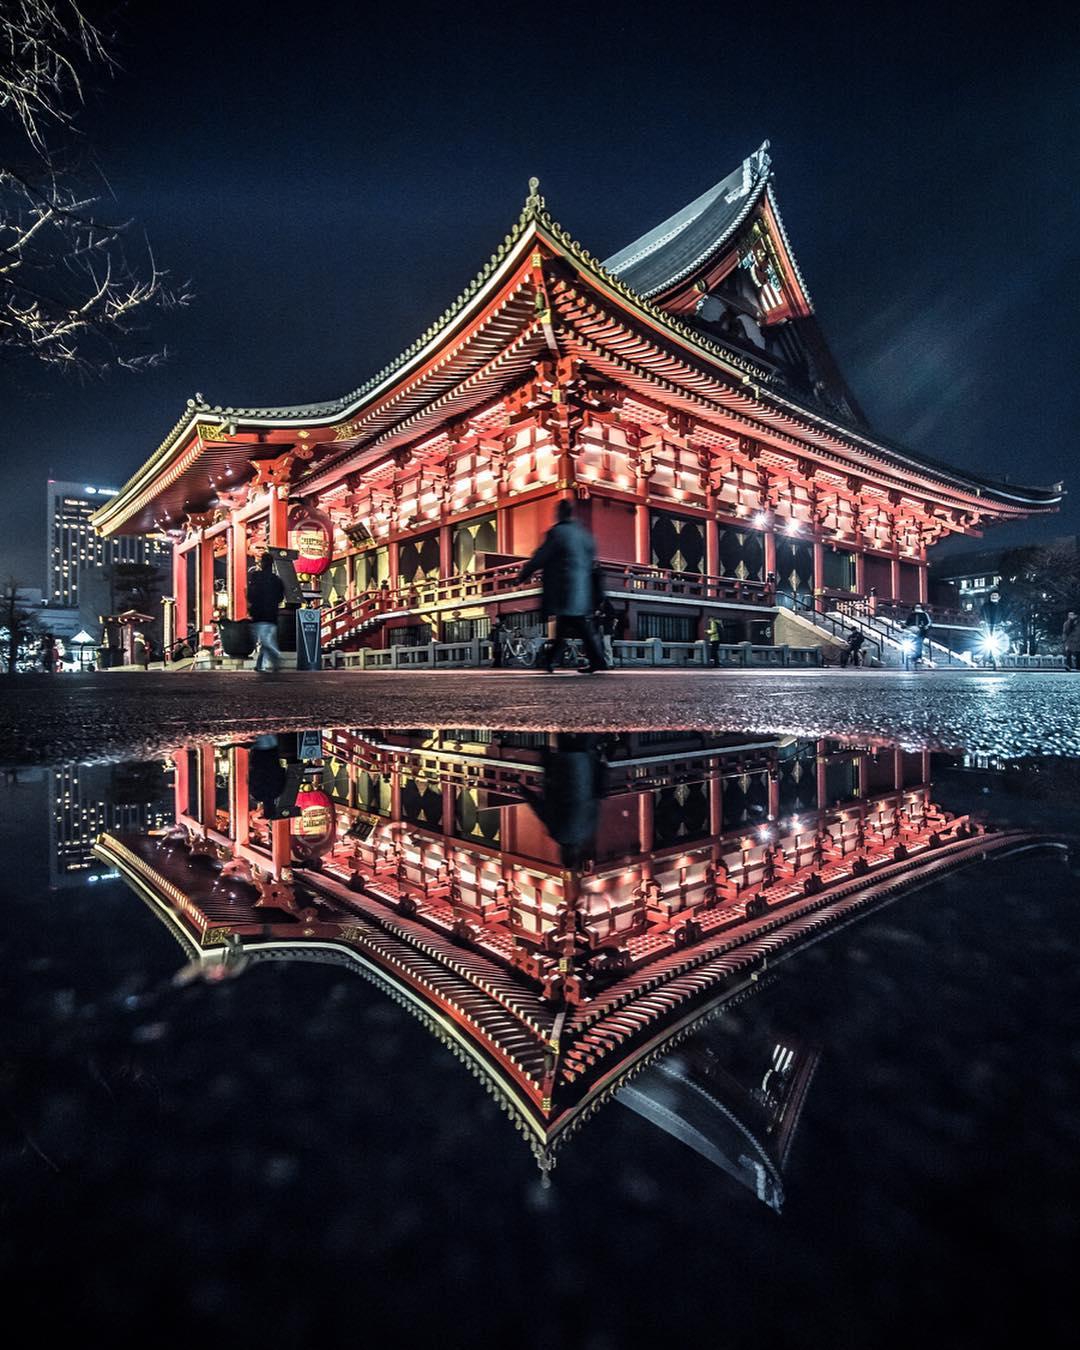 tokyo-nightlife-photography-hosokawa-ryohei-1